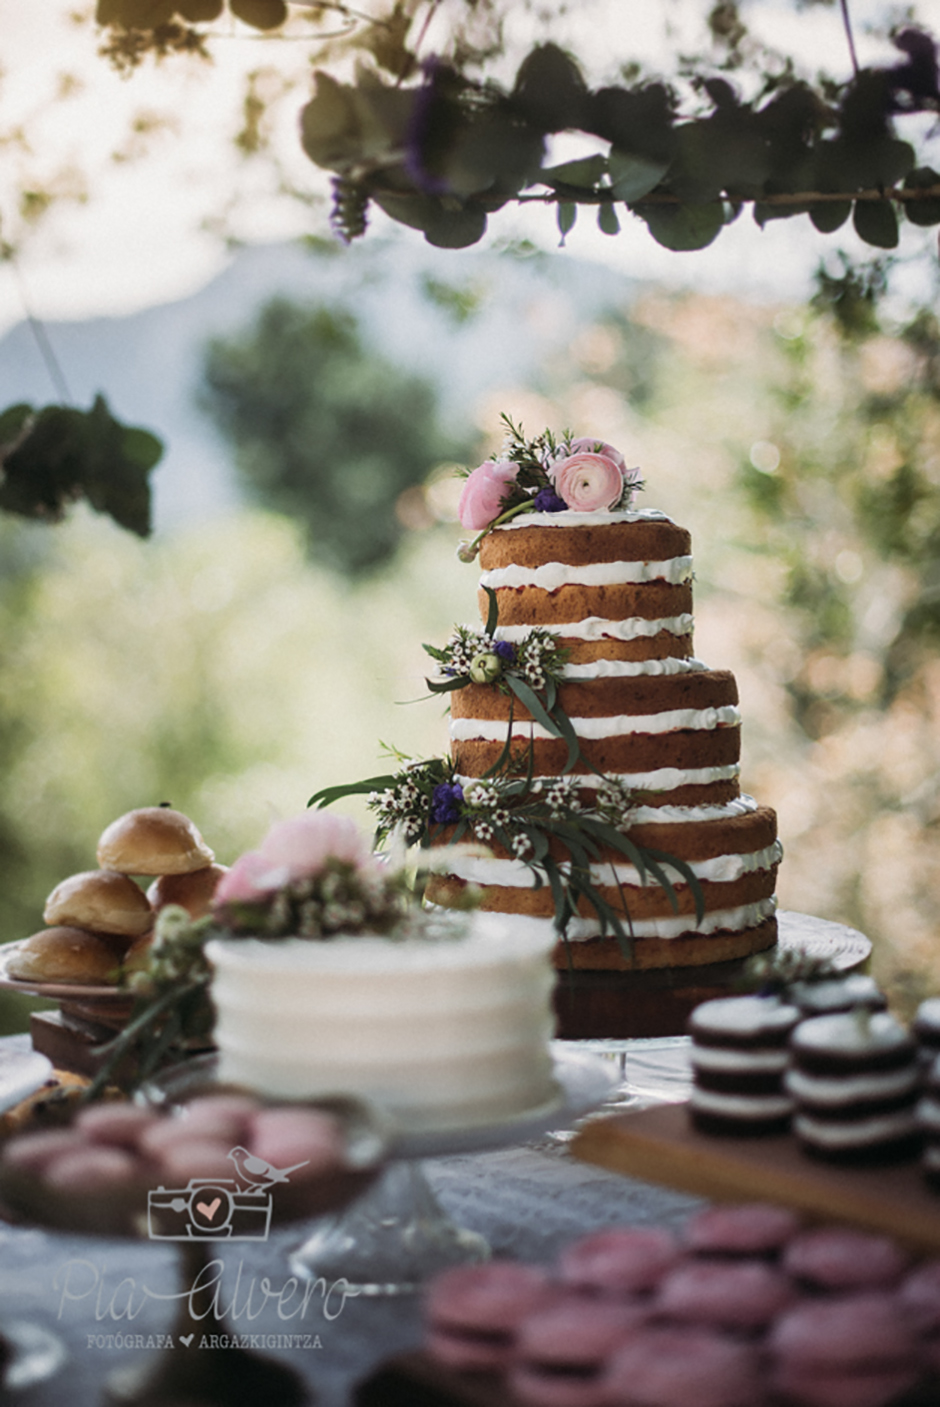 Pia Alvero fotografia editorial inspiracion de boda-139